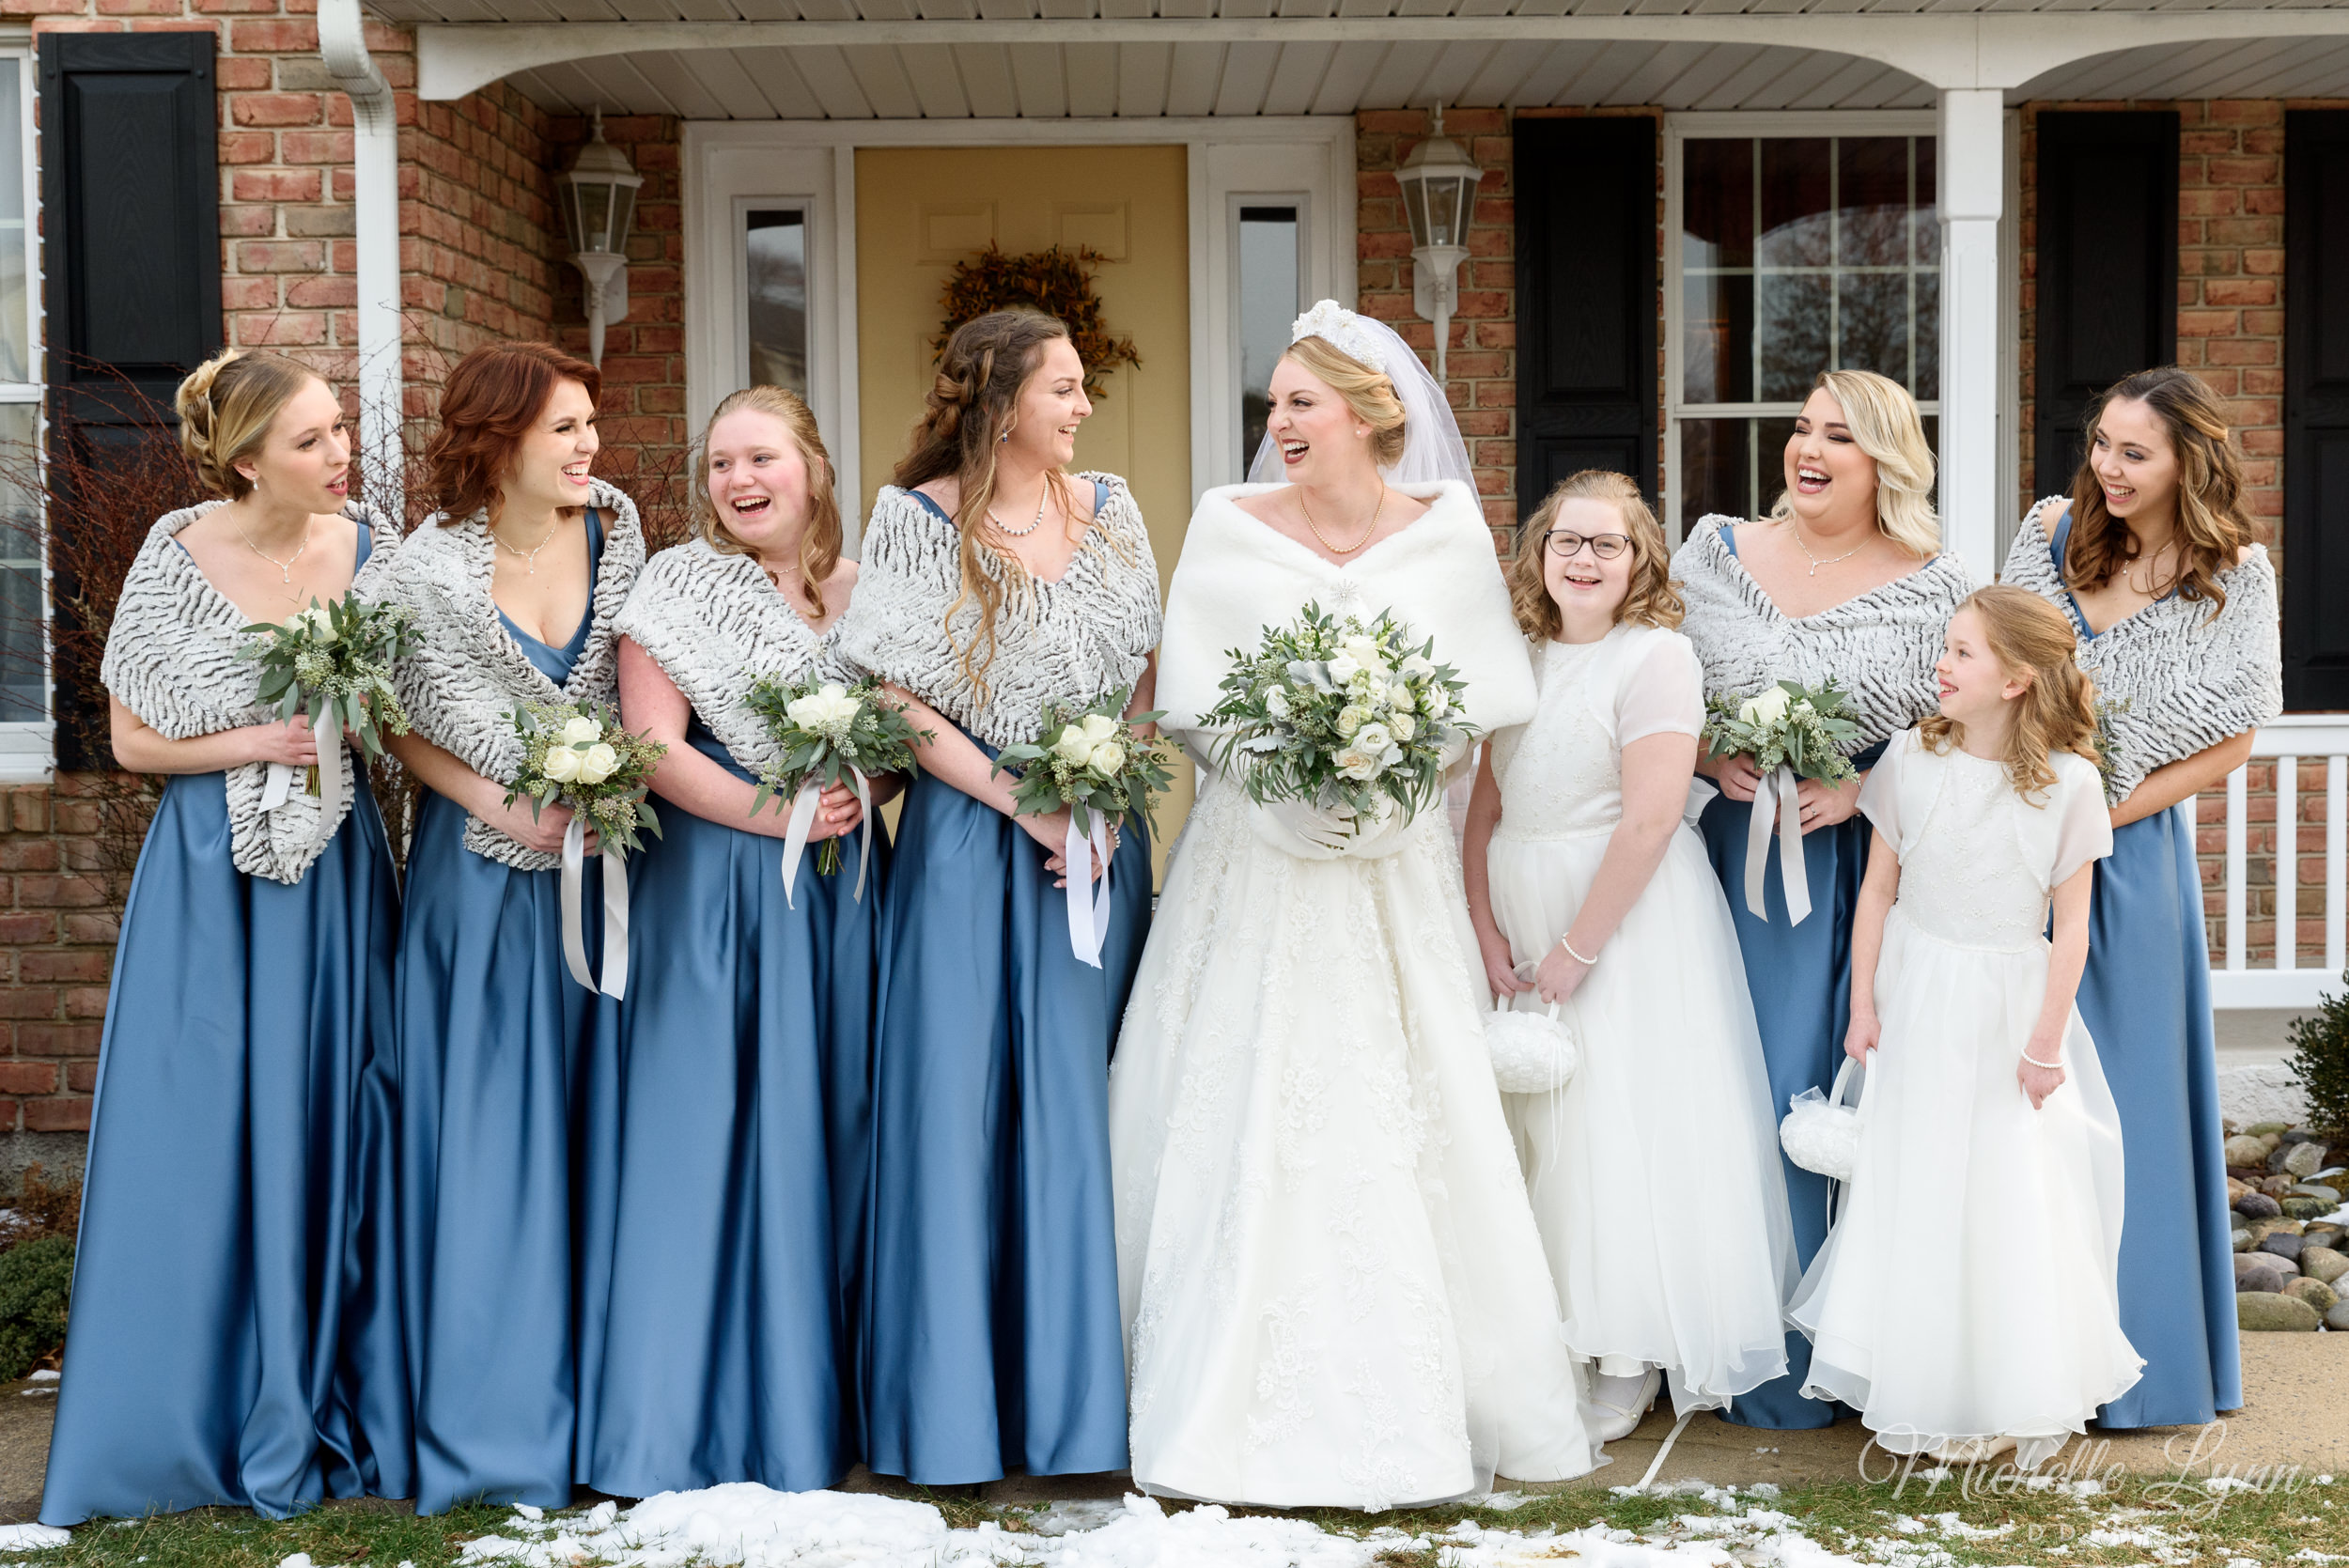 william-penn-inn-wedding-photography-mlw-31.jpg